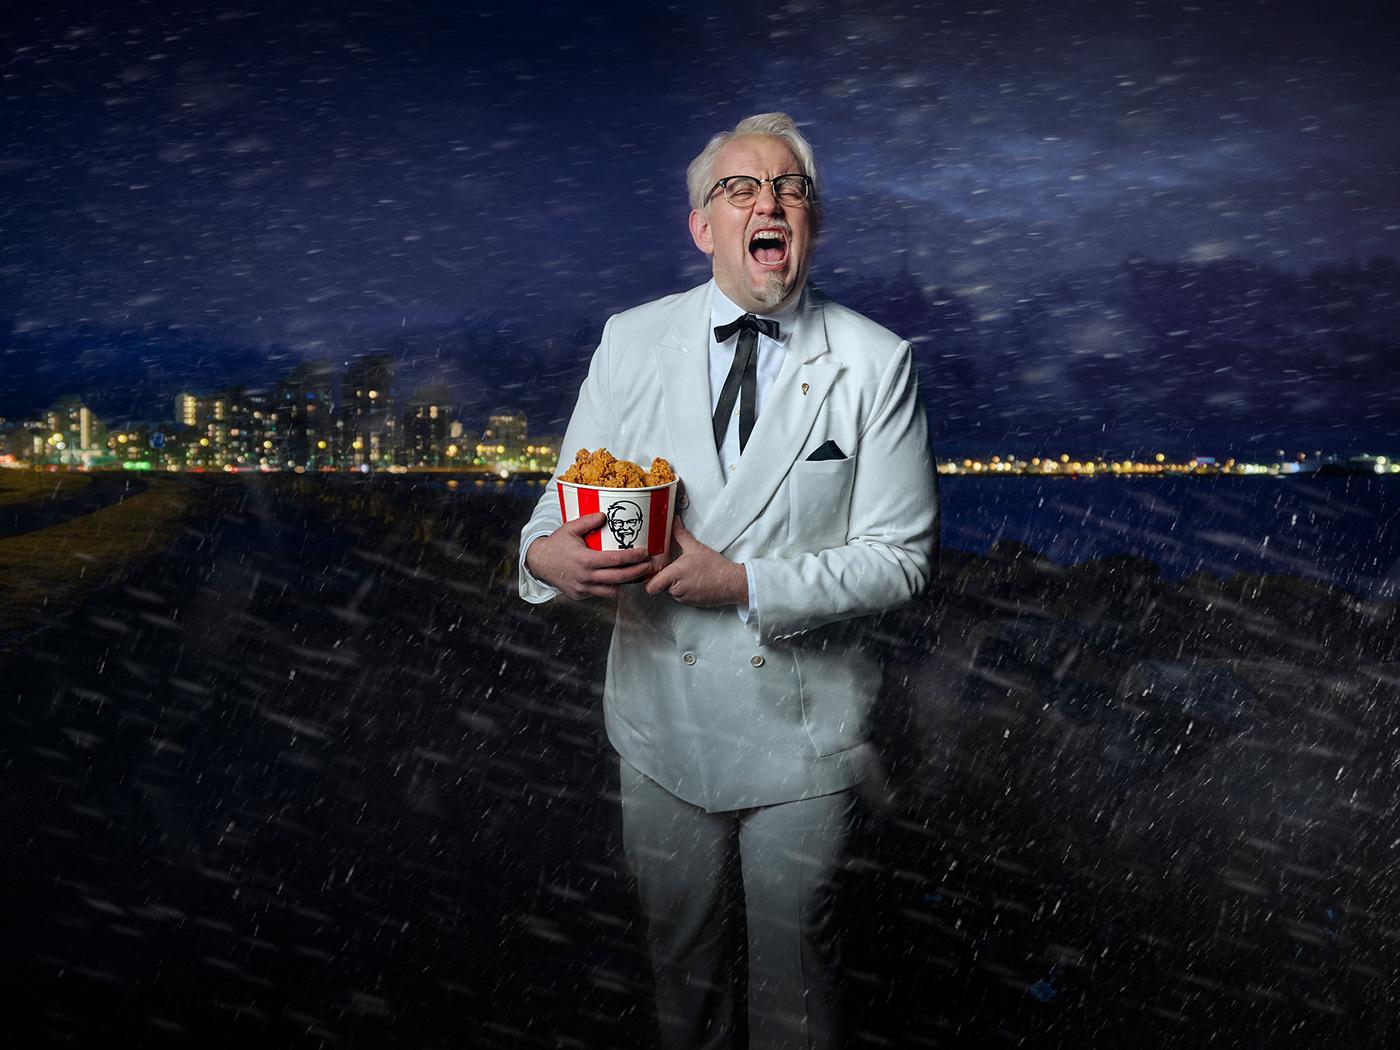 Campaign for KFC